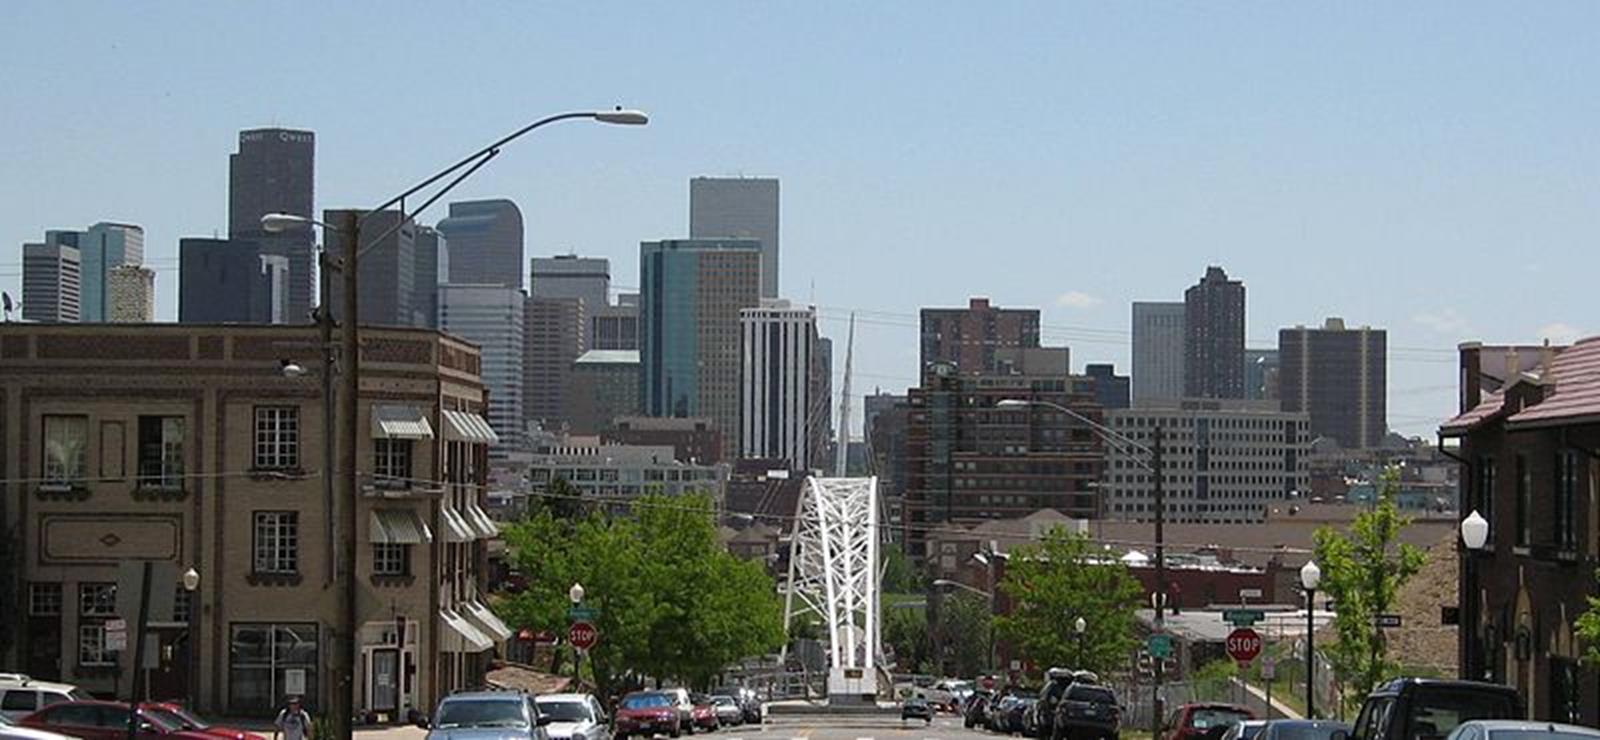 Downtown Denver